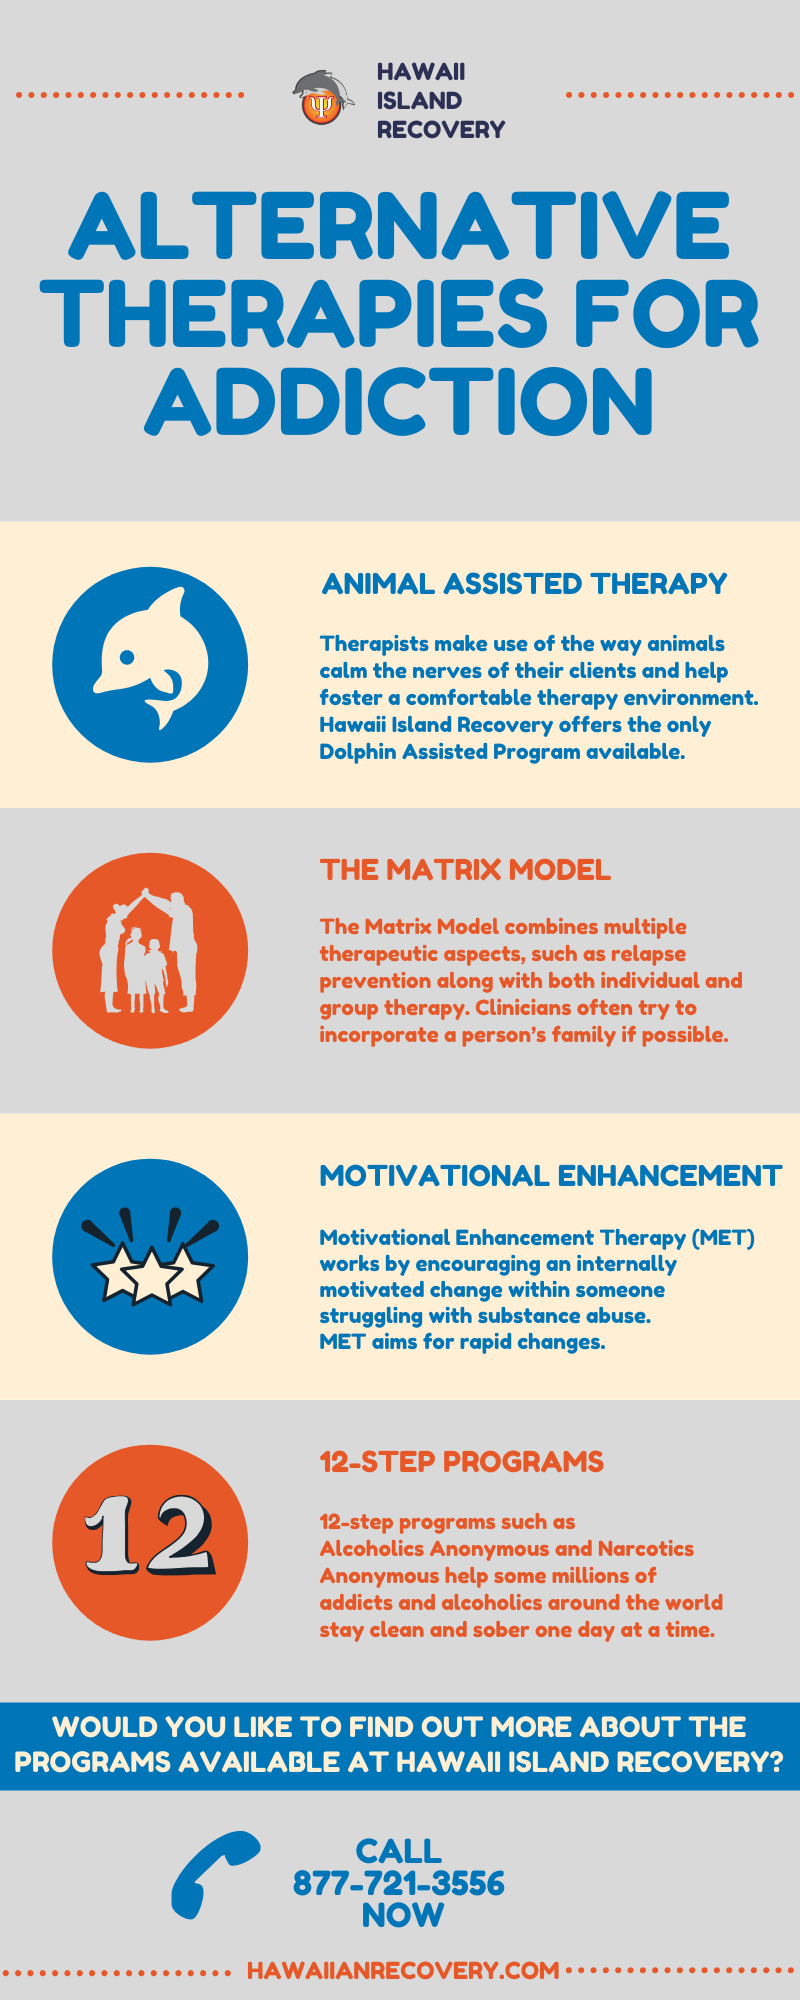 Alternative therapies for addiction